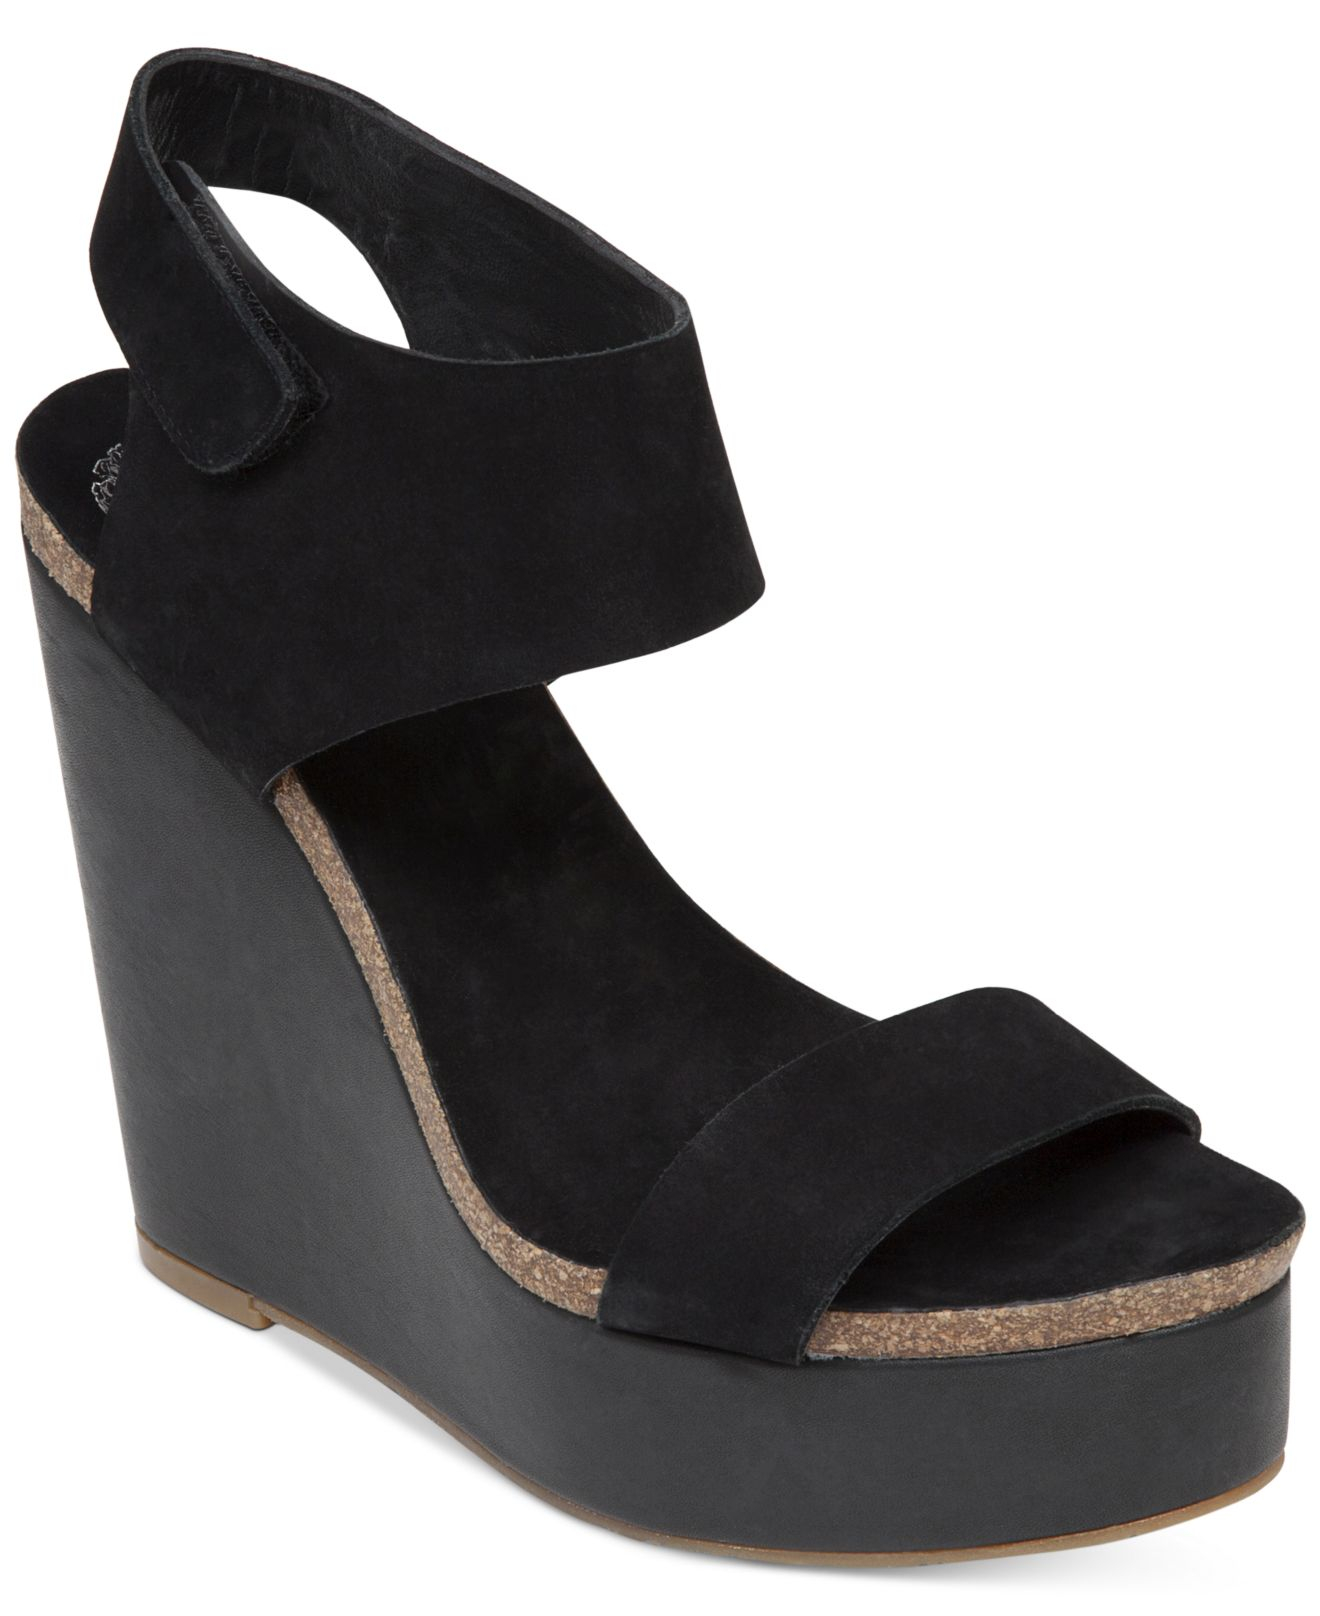 vince camuto kaja platform wedge sandals in black lyst